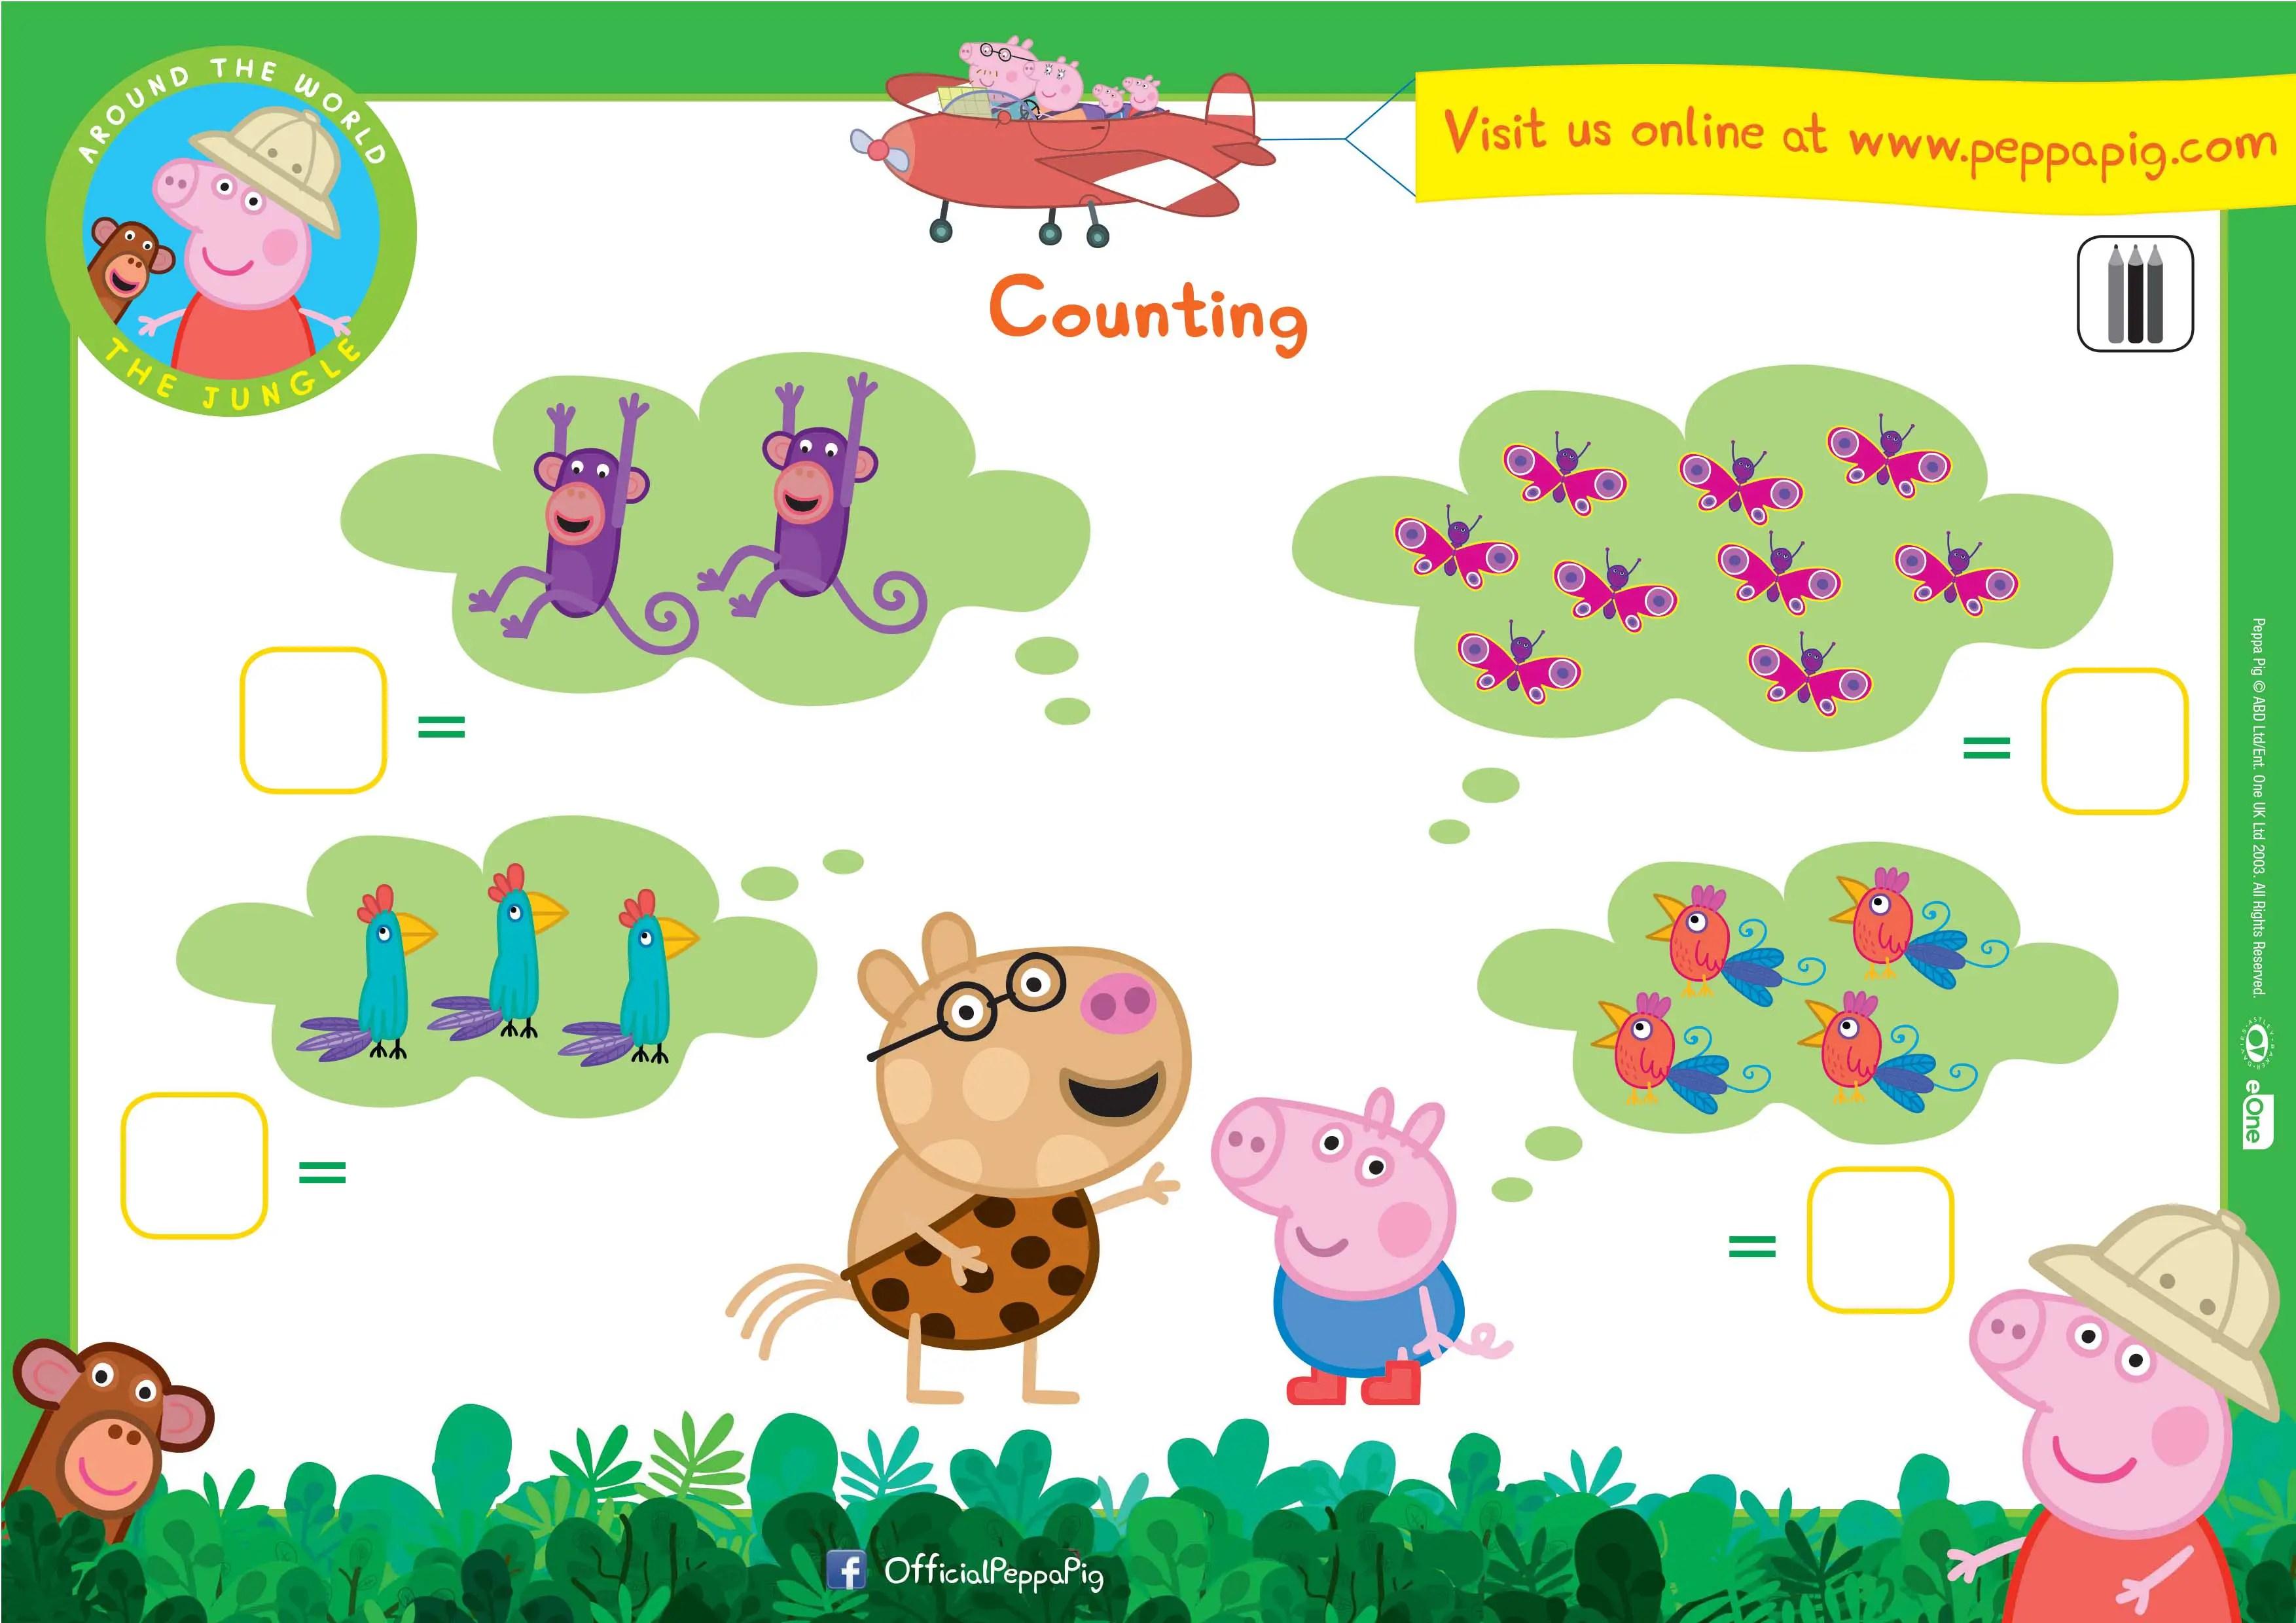 Peppa Pig Downloadable Activity Sheets